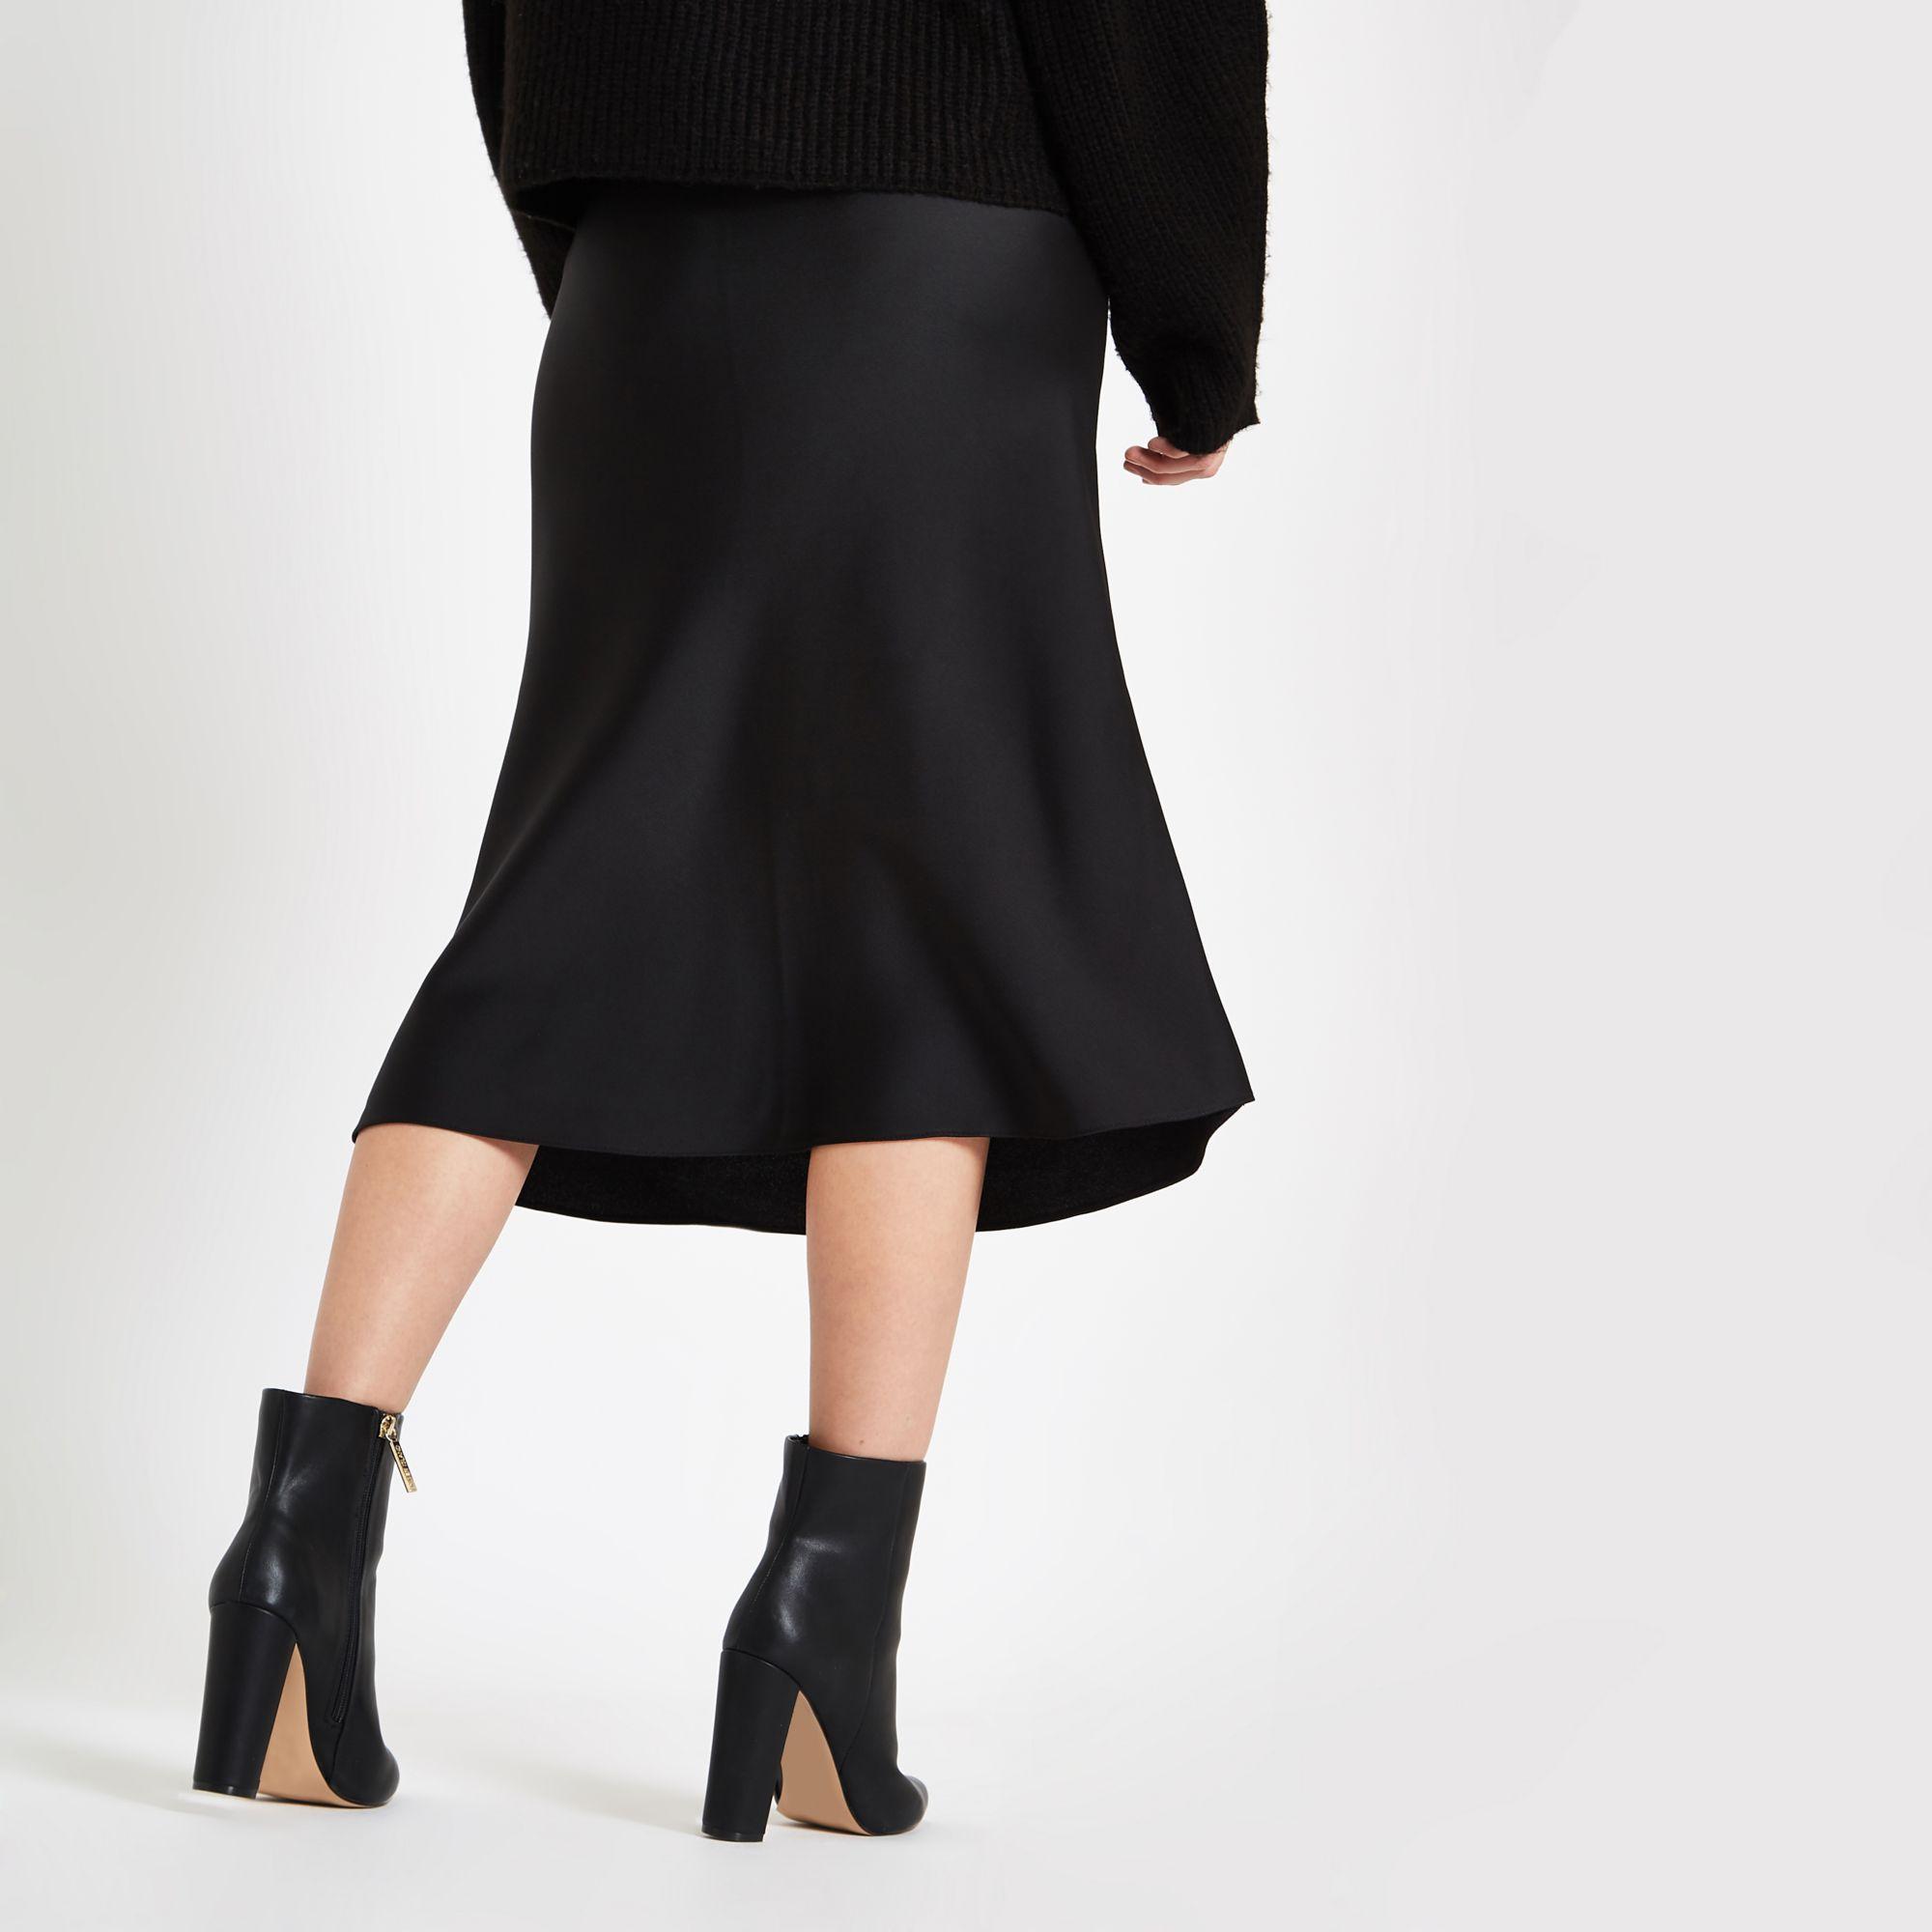 superior quality 2018 shoes finest fabrics Lyst - River Island Bias Cut Midi Skirt in Black